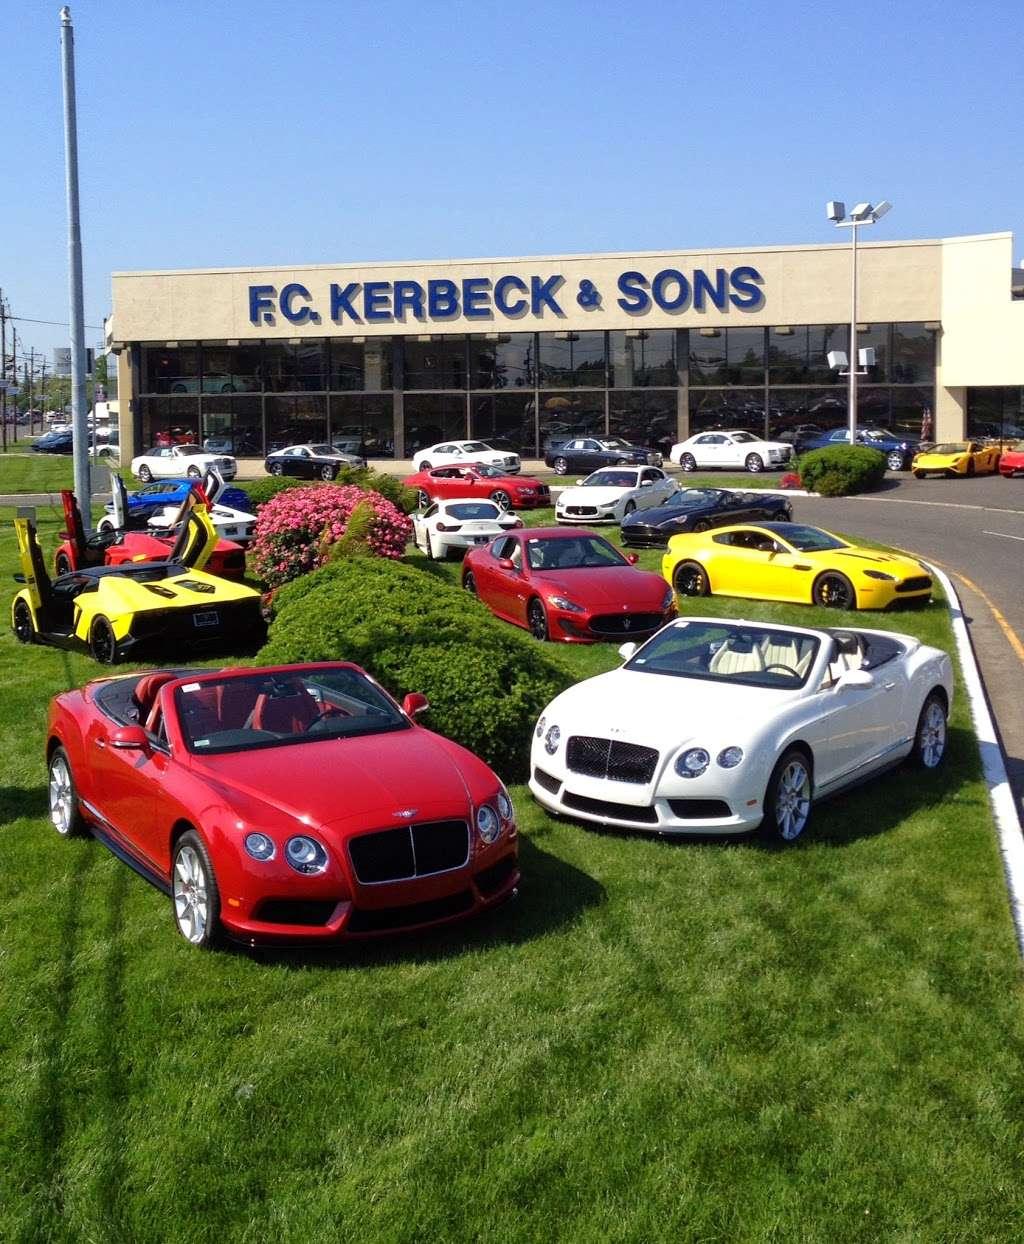 F.C. Kerbeck Rolls-Royce, 100 NJ-73, Palmyra, NJ 08065, USA